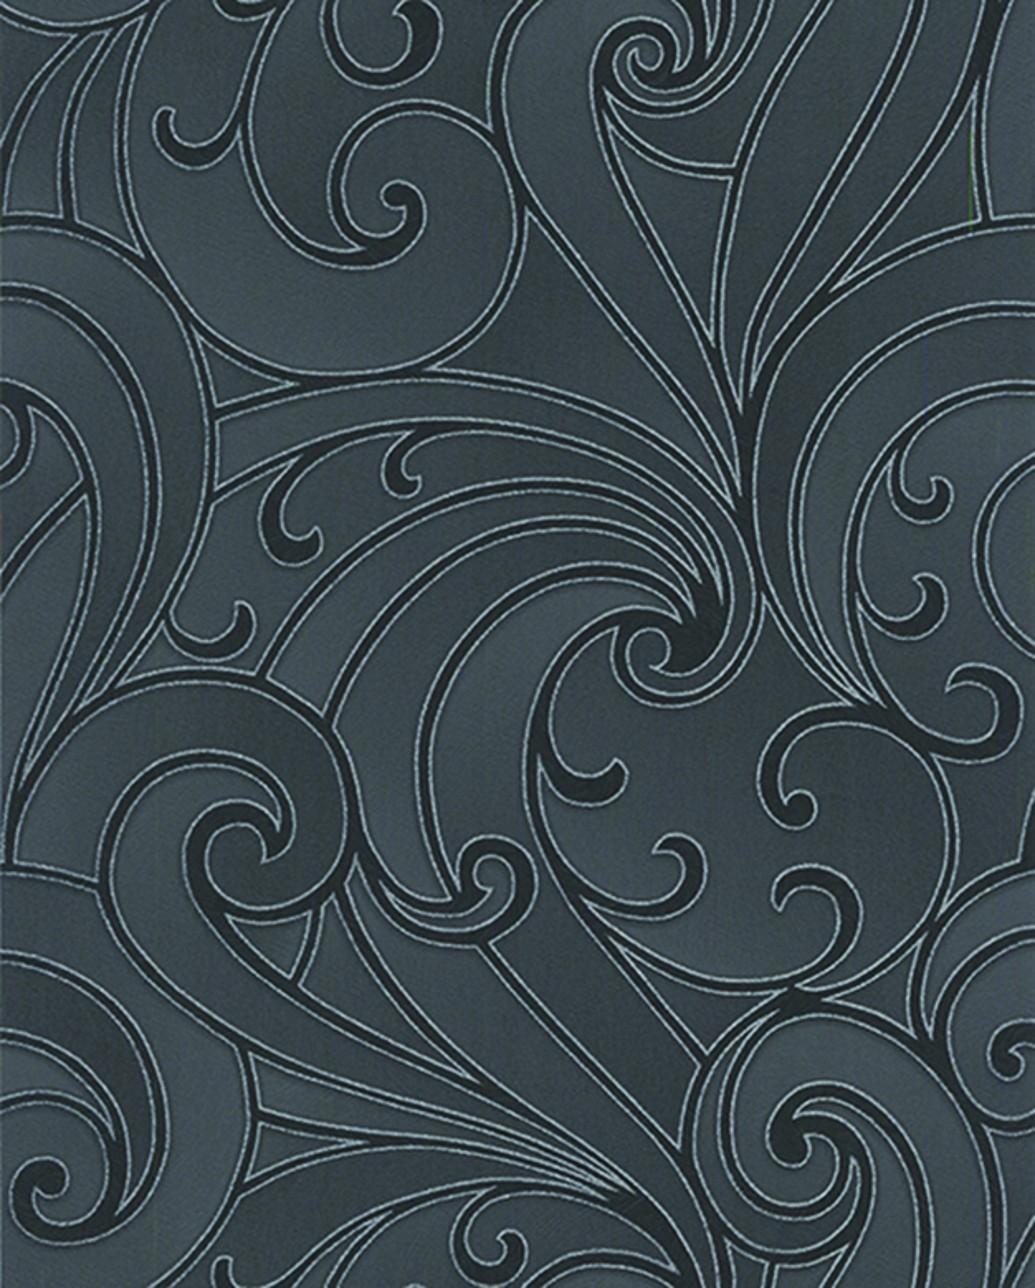 Tapety na zeď Vavex 20-010 | 0,53 x 10,05 m (Vinylová tapeta - šedá)